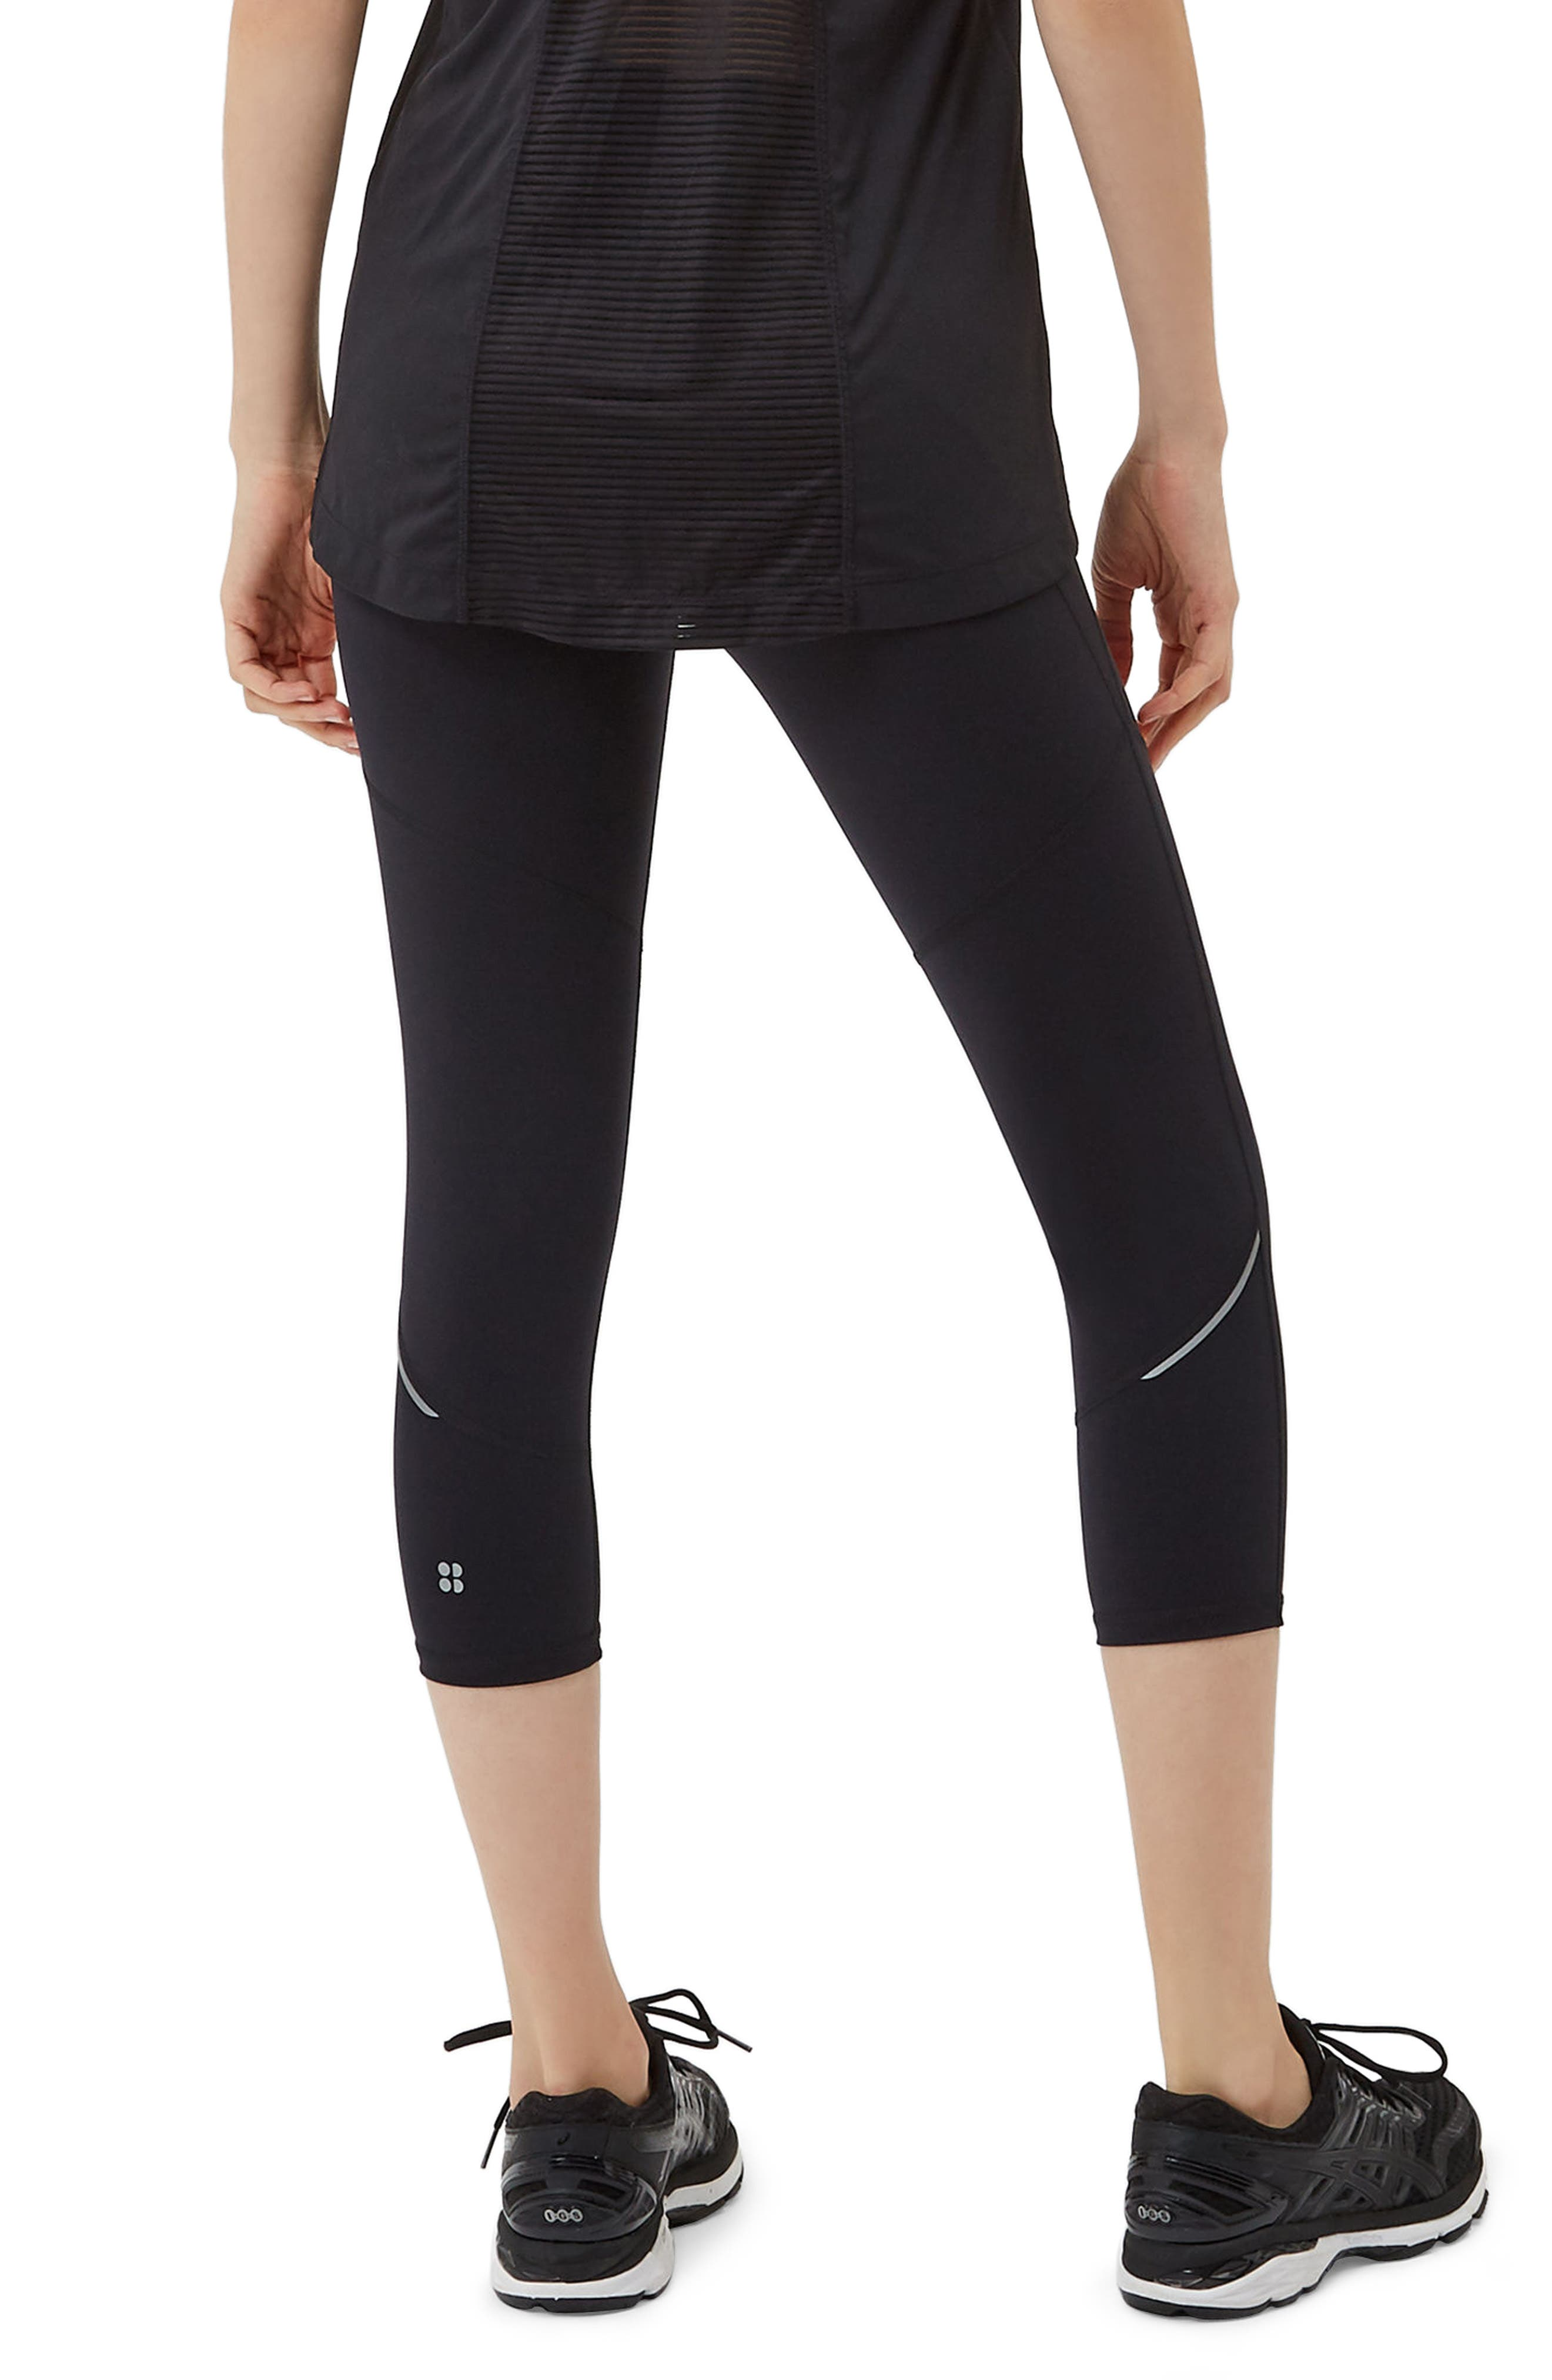 SWEATY BETTY, Power Workout Crop Leggings, Alternate thumbnail 4, color, BLACK